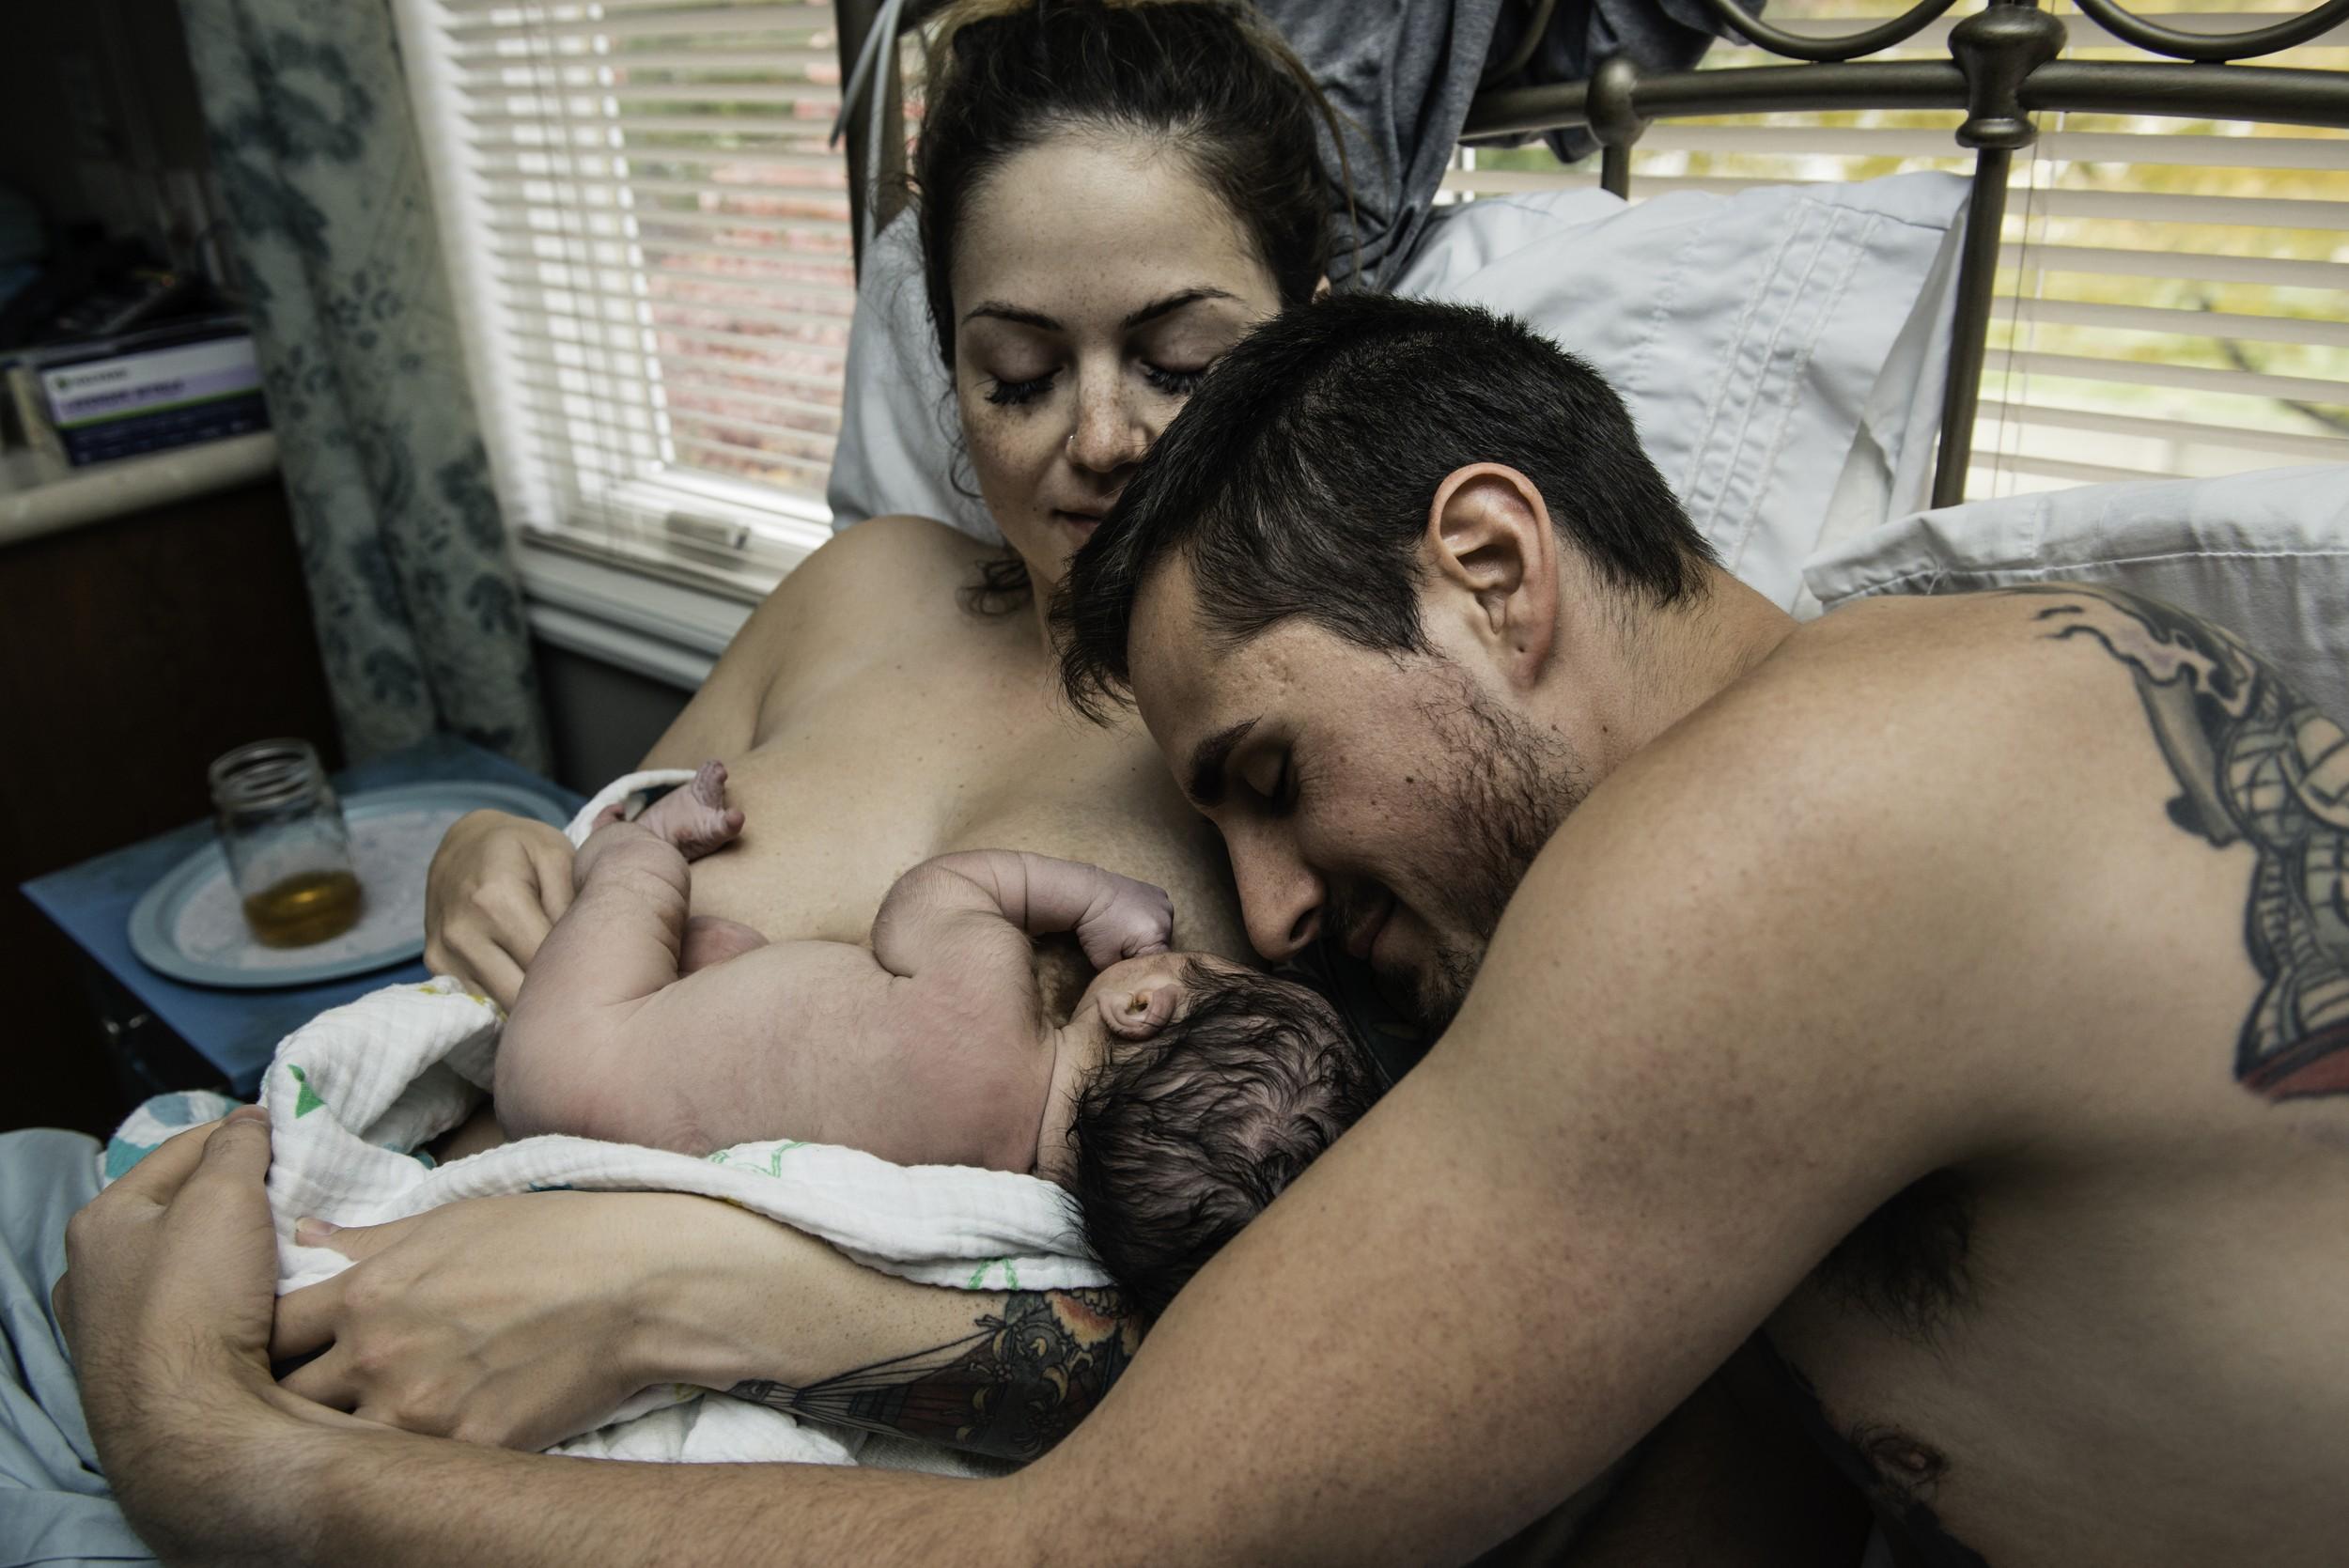 A-waterbirth-story-at-the-birth-center-in-Murray-utah-salt-lake-city-birth-photographer-birth-videography,-natural-birth,-homebirth-66.jpg